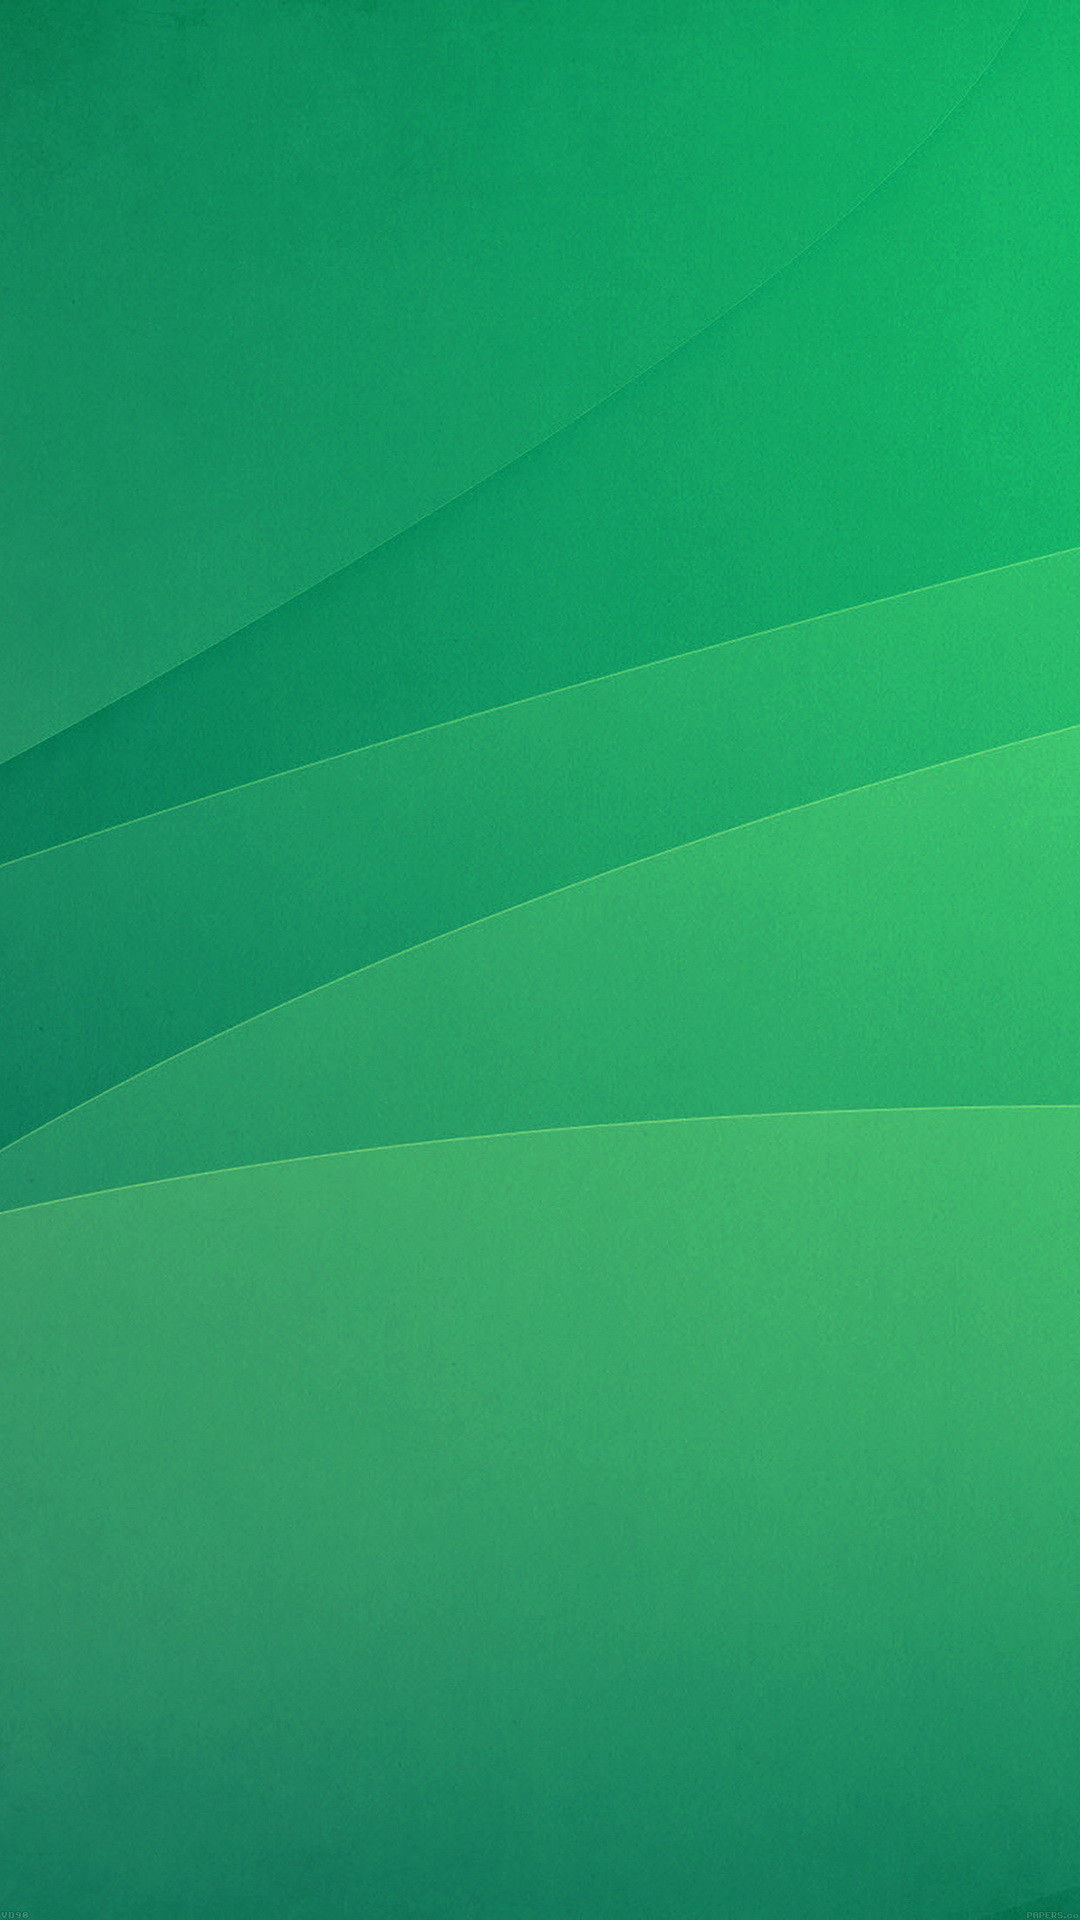 1080x1920 Green Alive Gradation Blur IPhone 6 Wallpaper